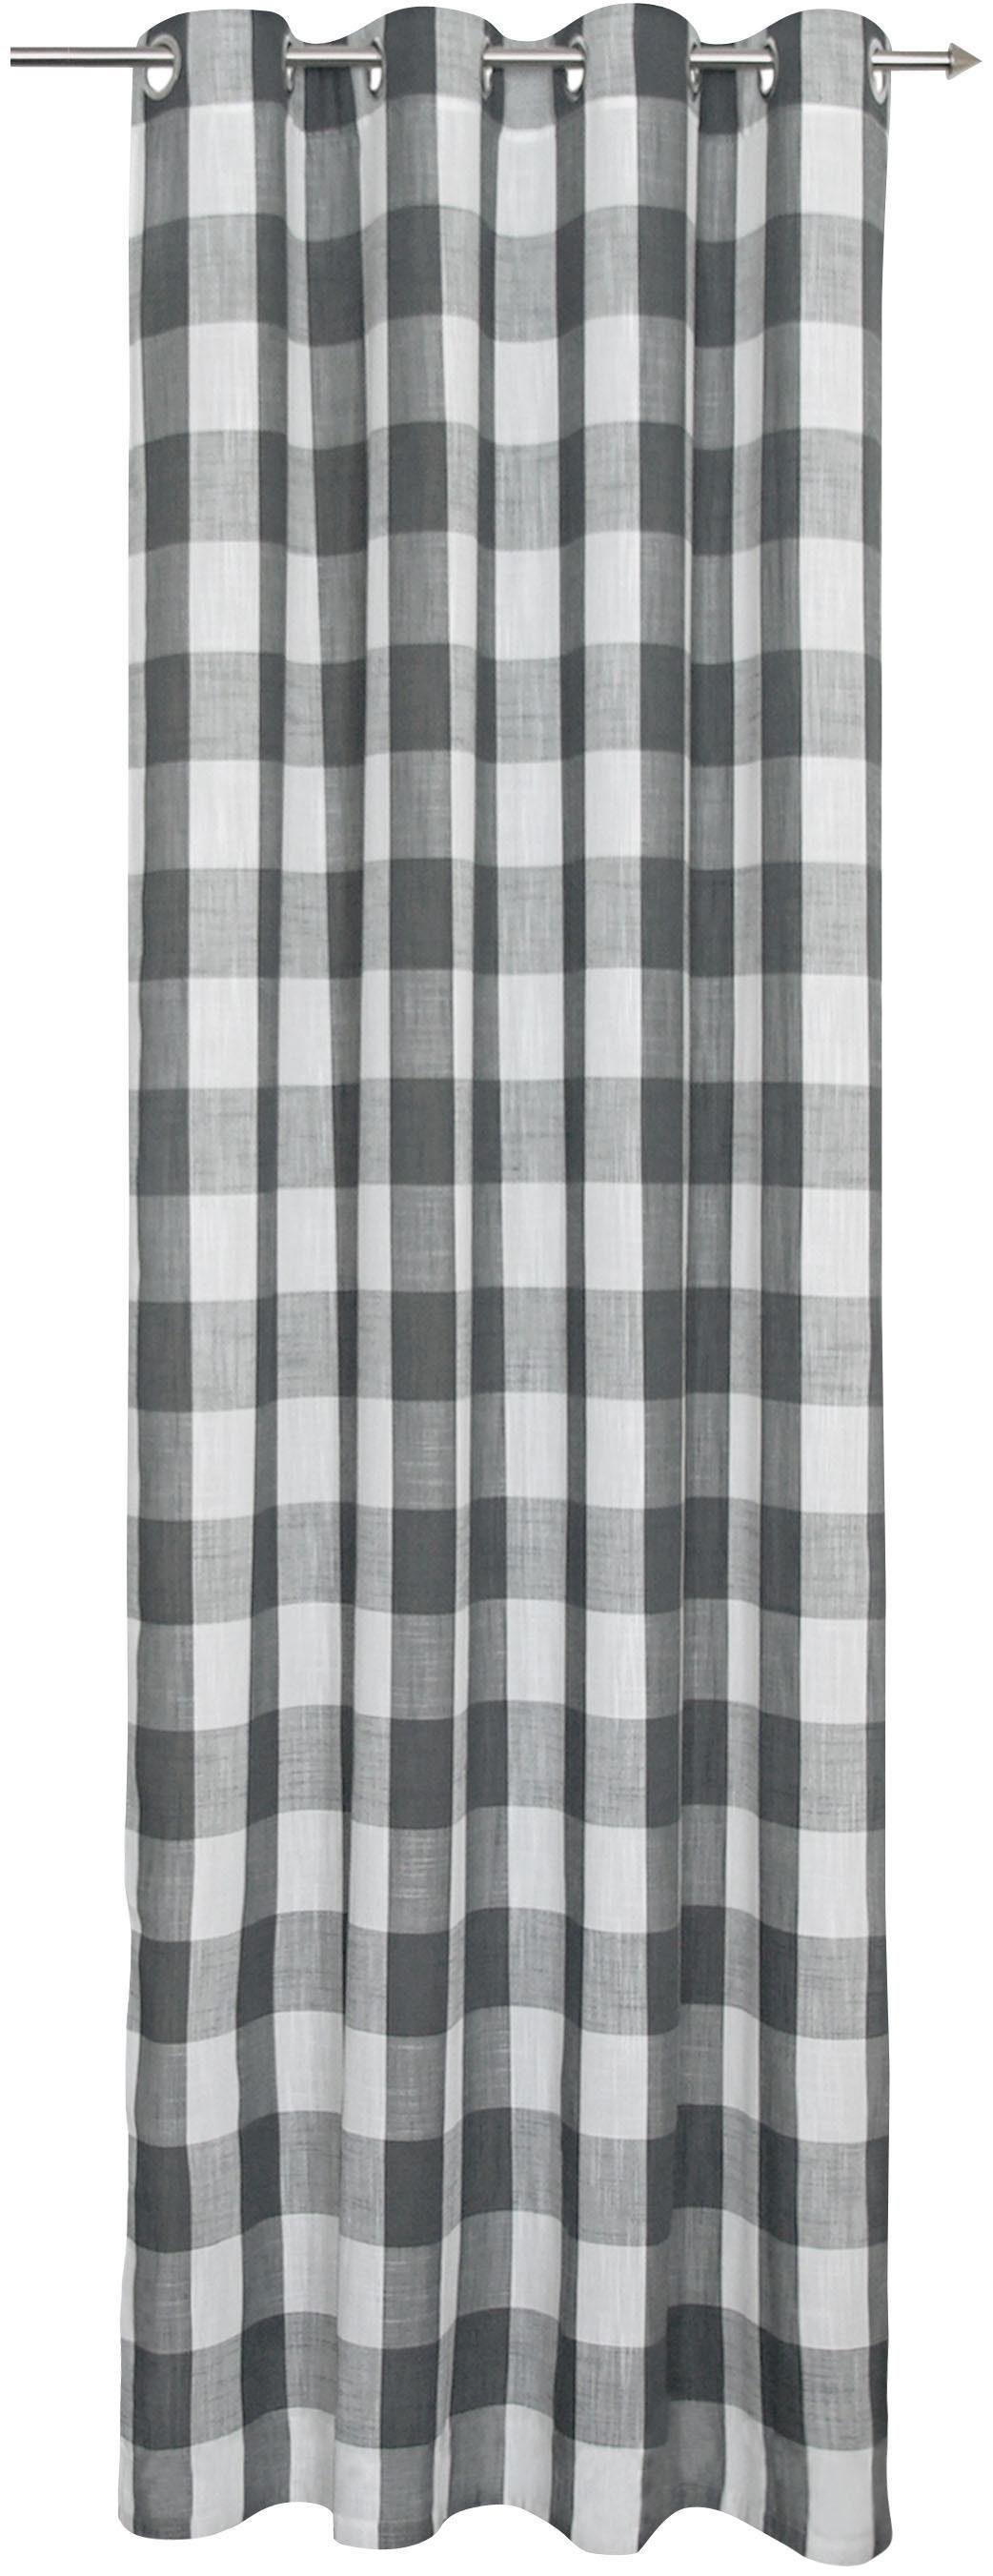 Vorhang »Val«, decolife, Ösen (1 Stück)